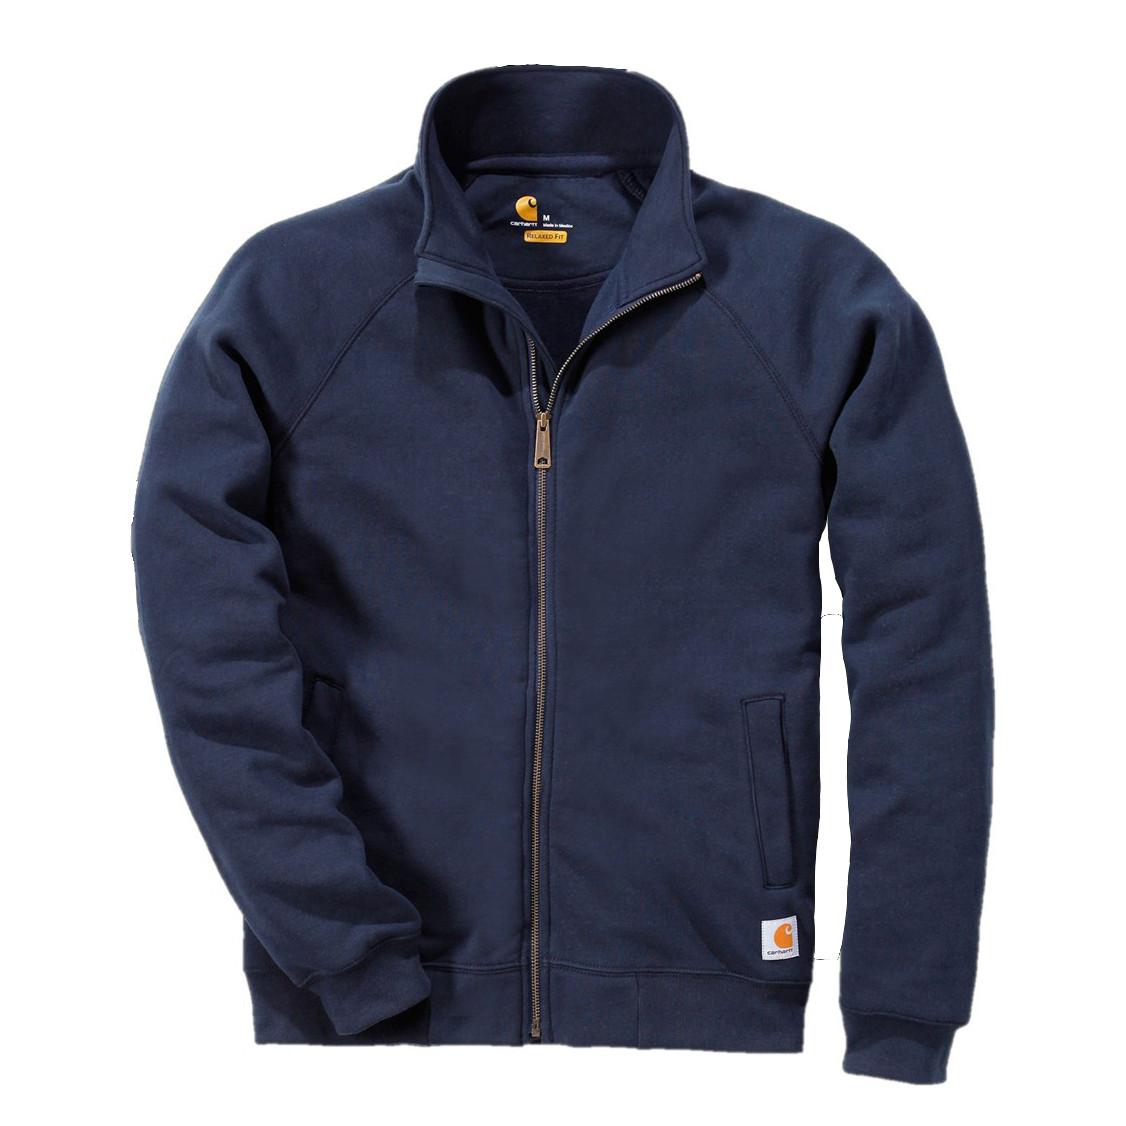 Свитшот на молнии Carhartt Midweight Mock Neck Zip Sweatshirt - K350 (New Navy, M)